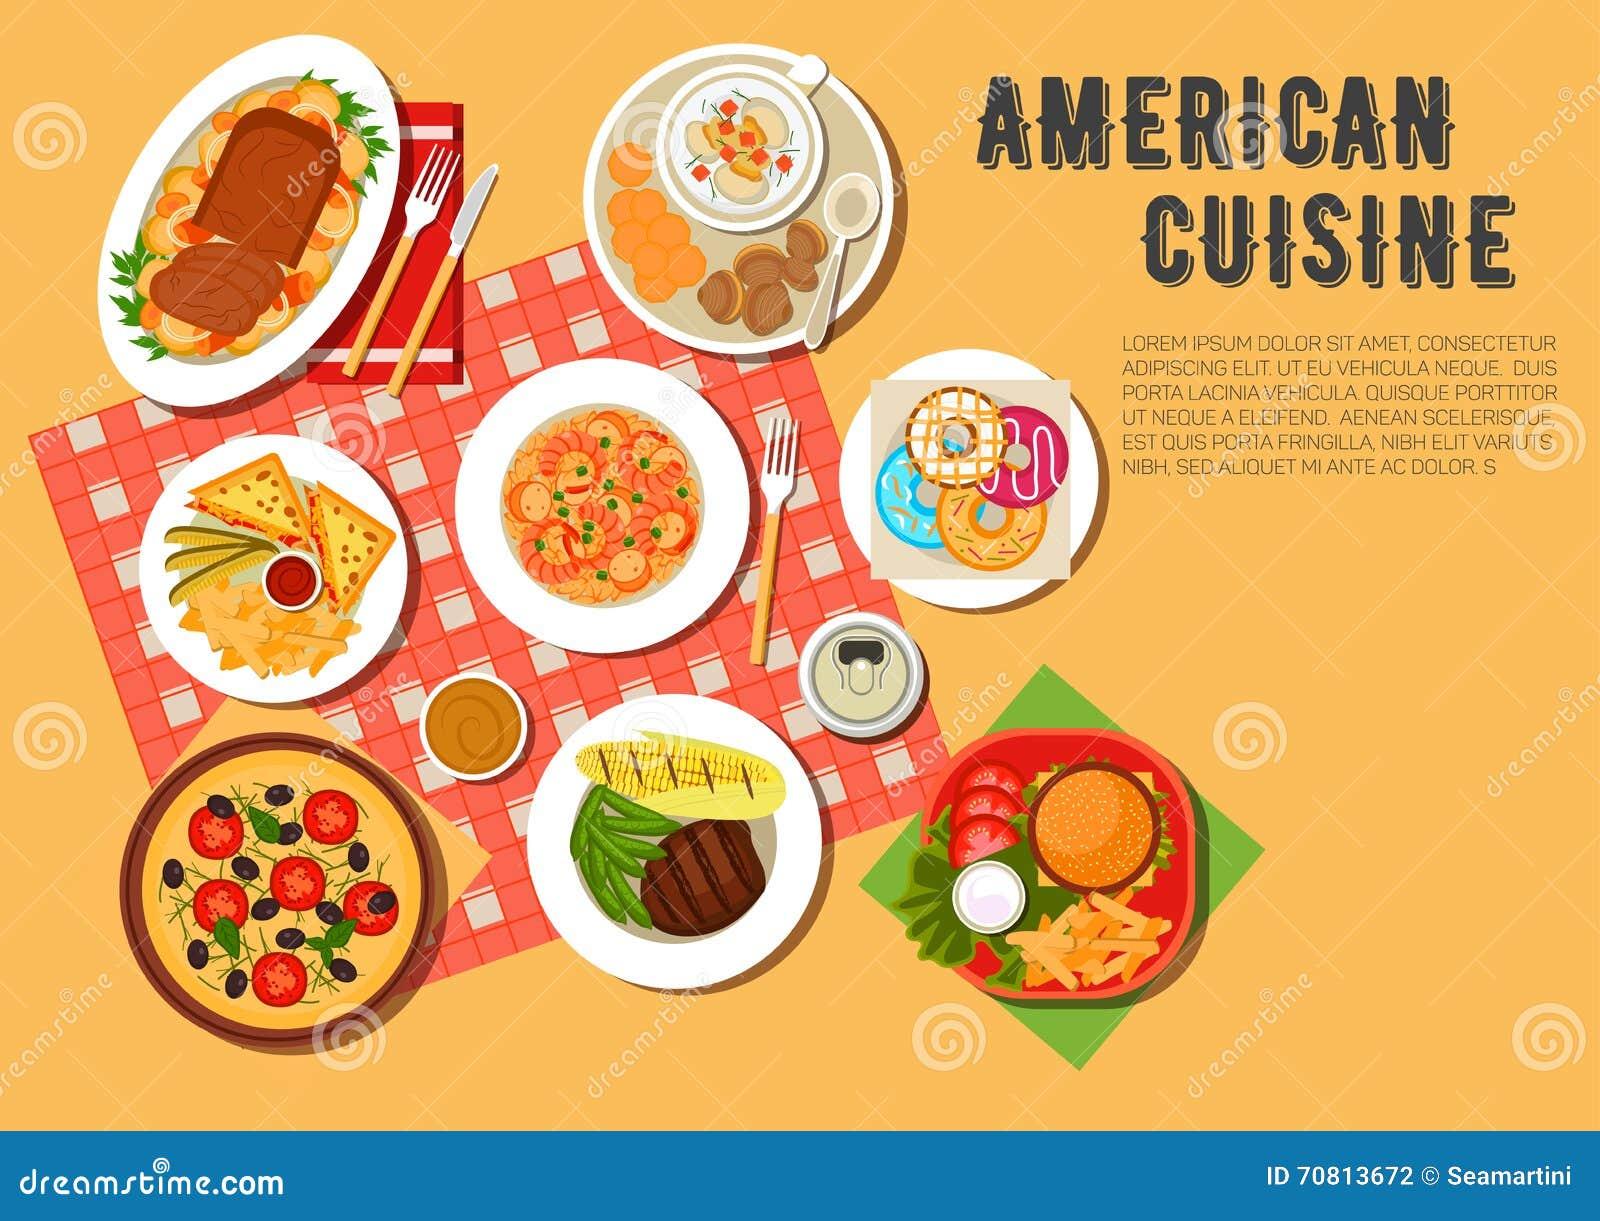 Traditional american picnic menu flat icon stock vector for American cuisine menu